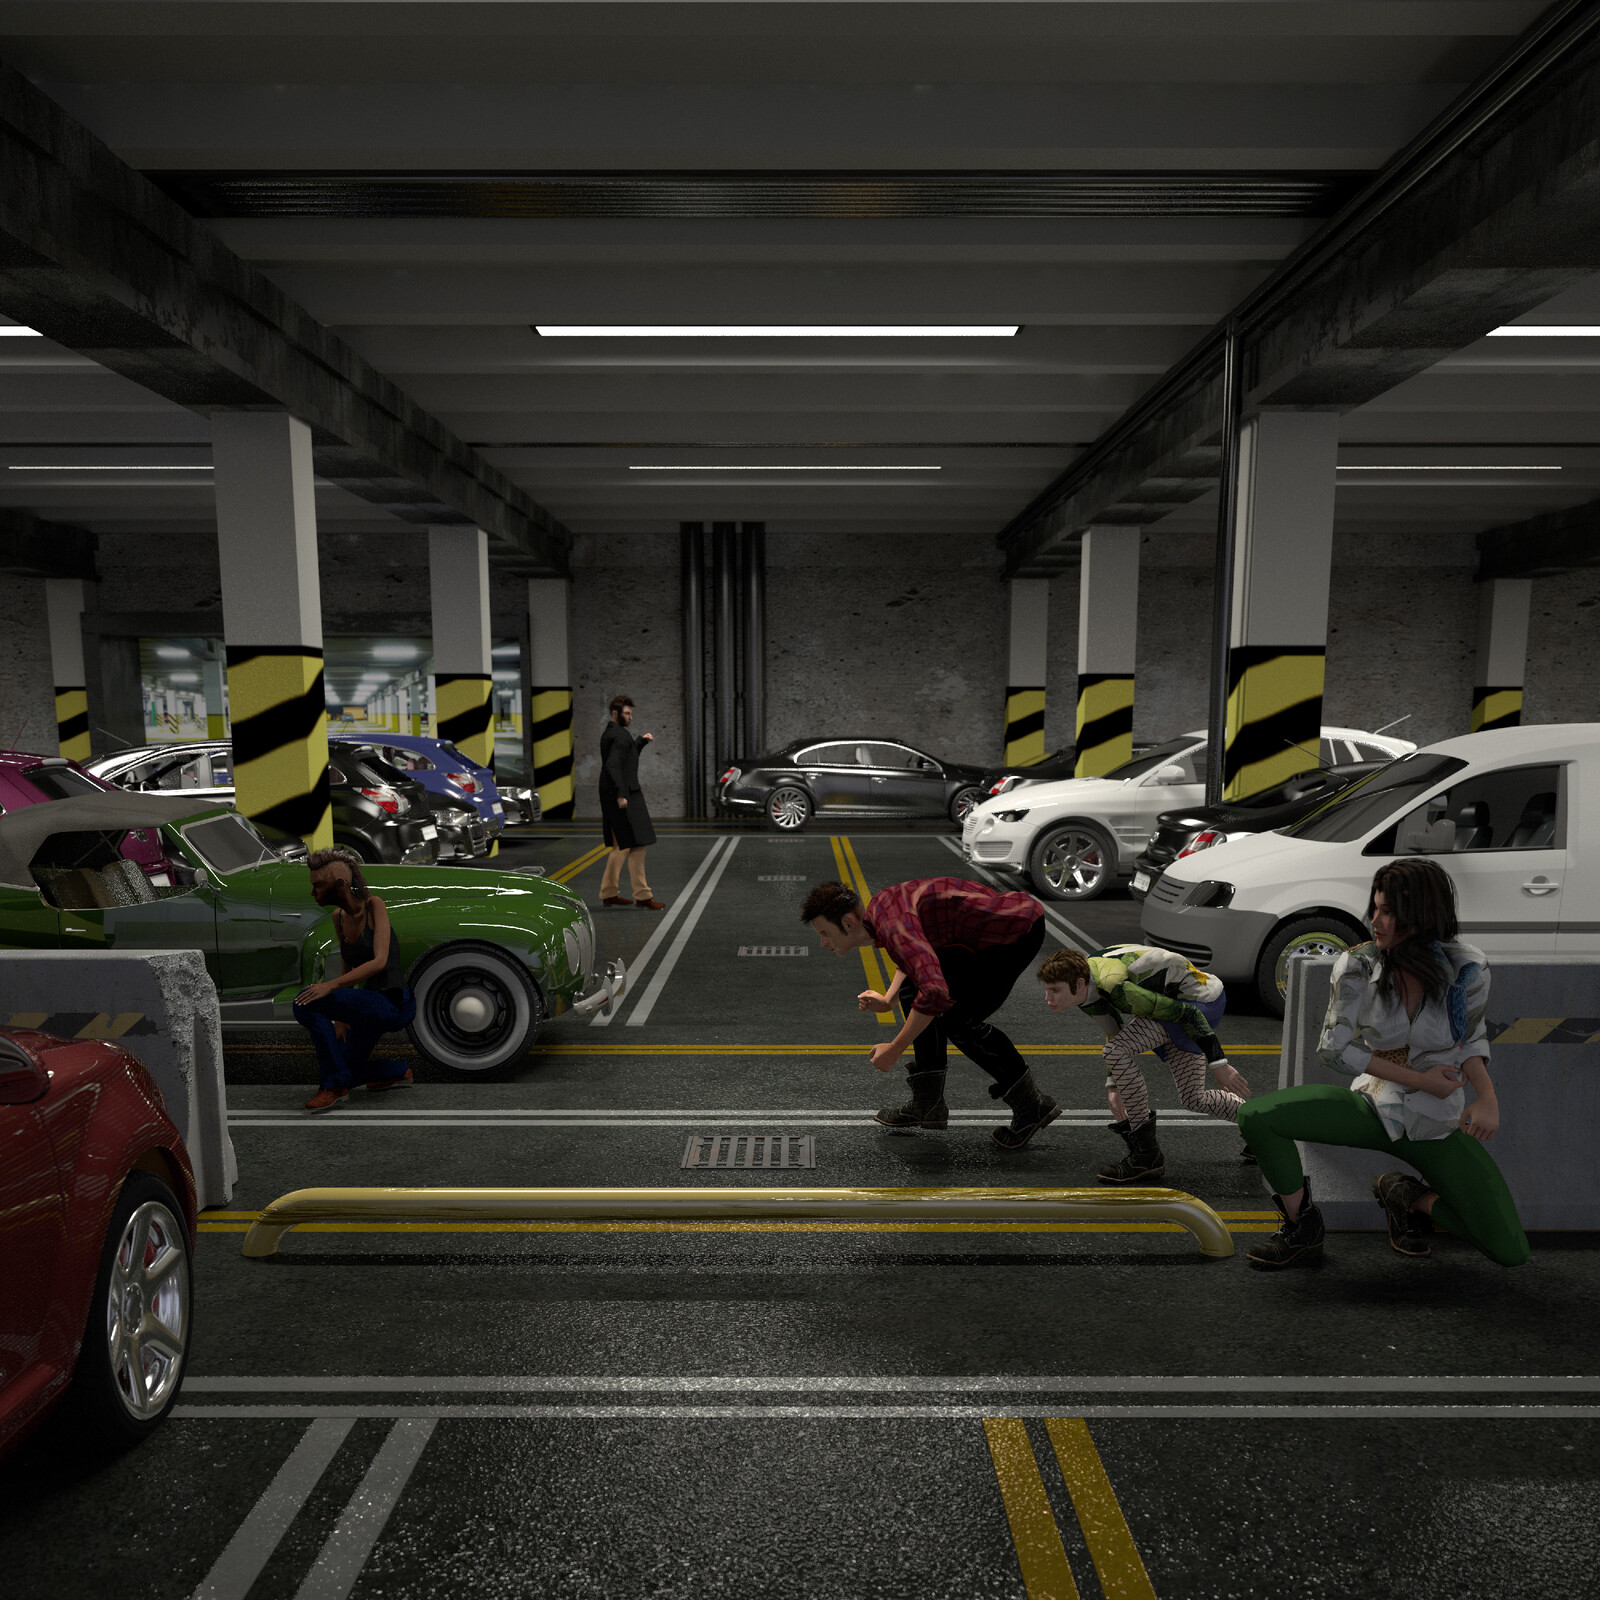 parking illustration